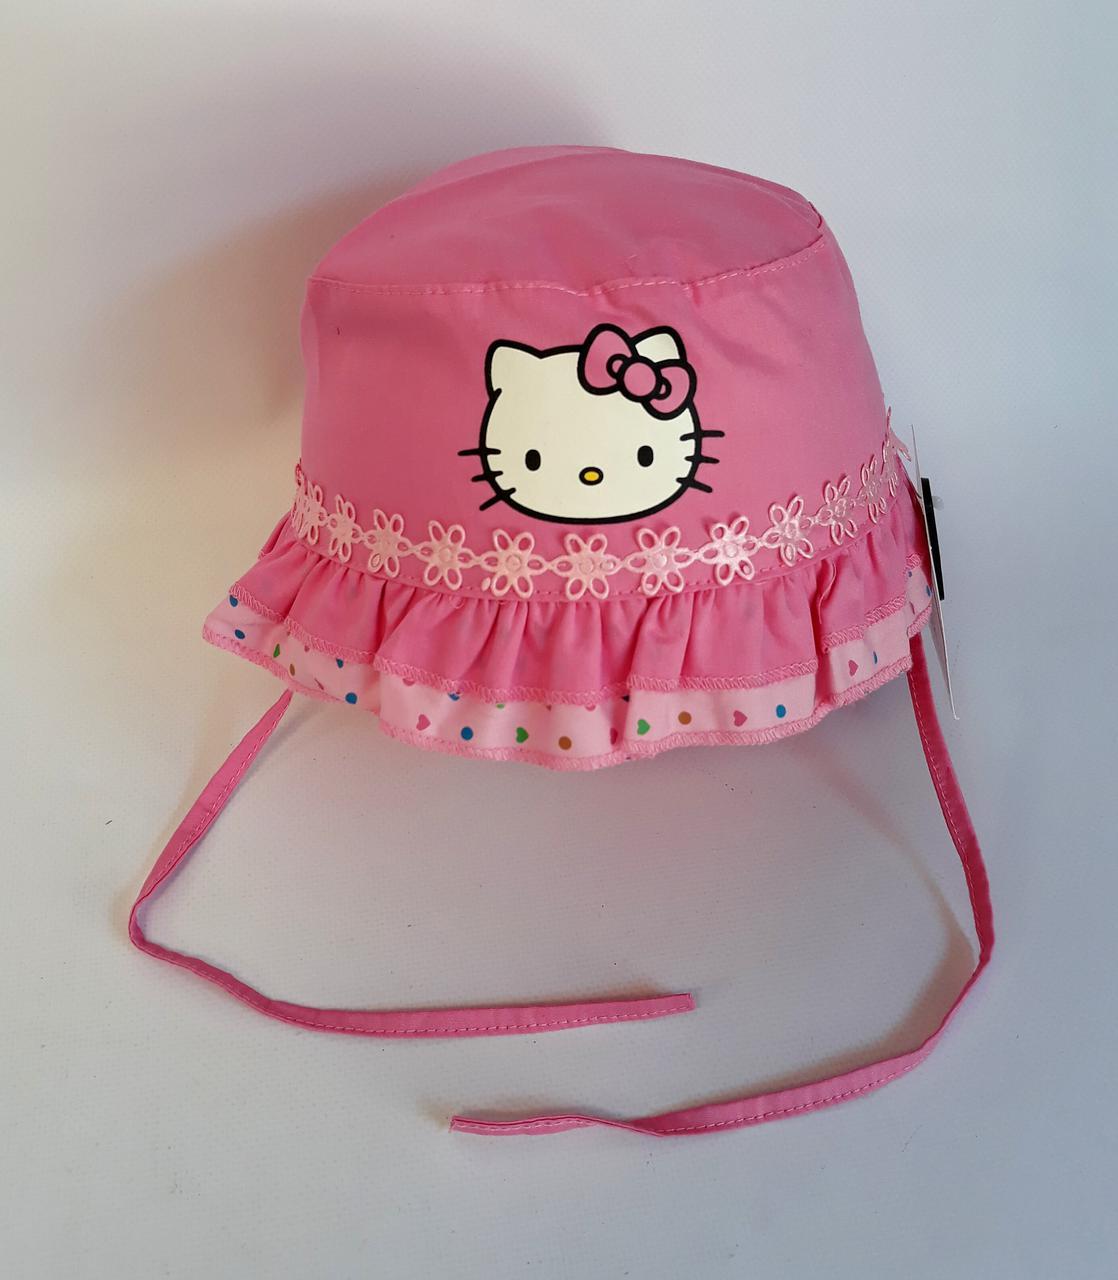 Головной убор для девочки. Панамка Hello Kitty Размер 50 UGR-328(50) Турция